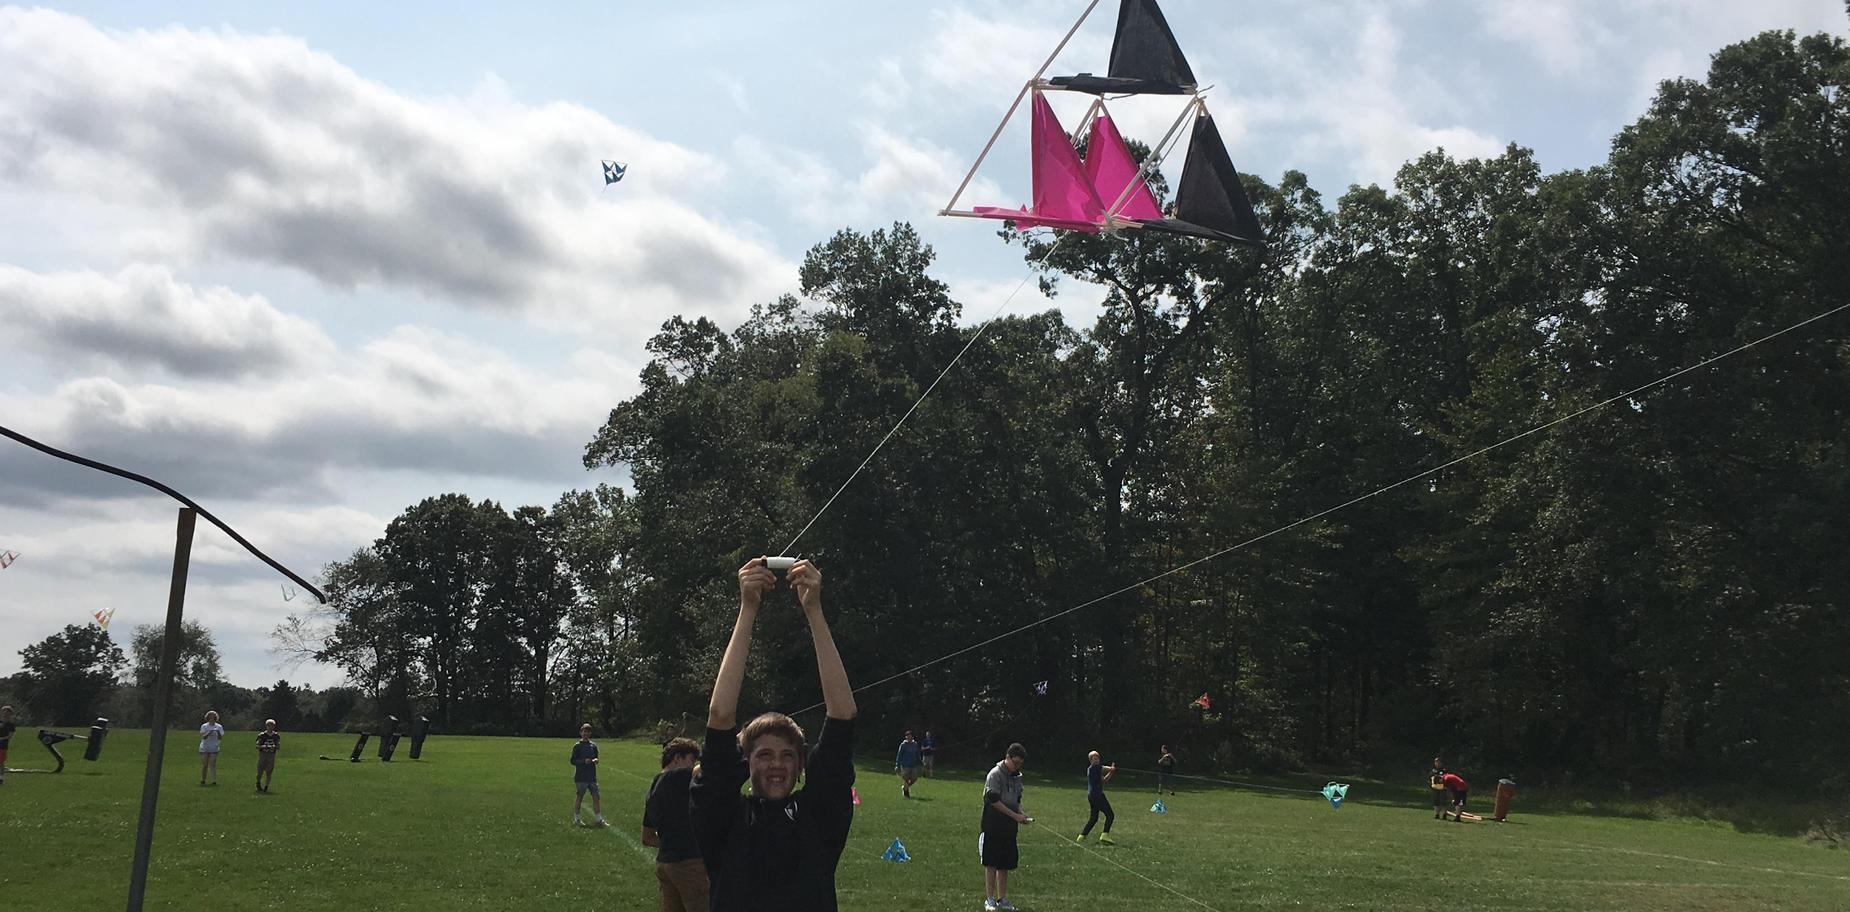 kite test flight